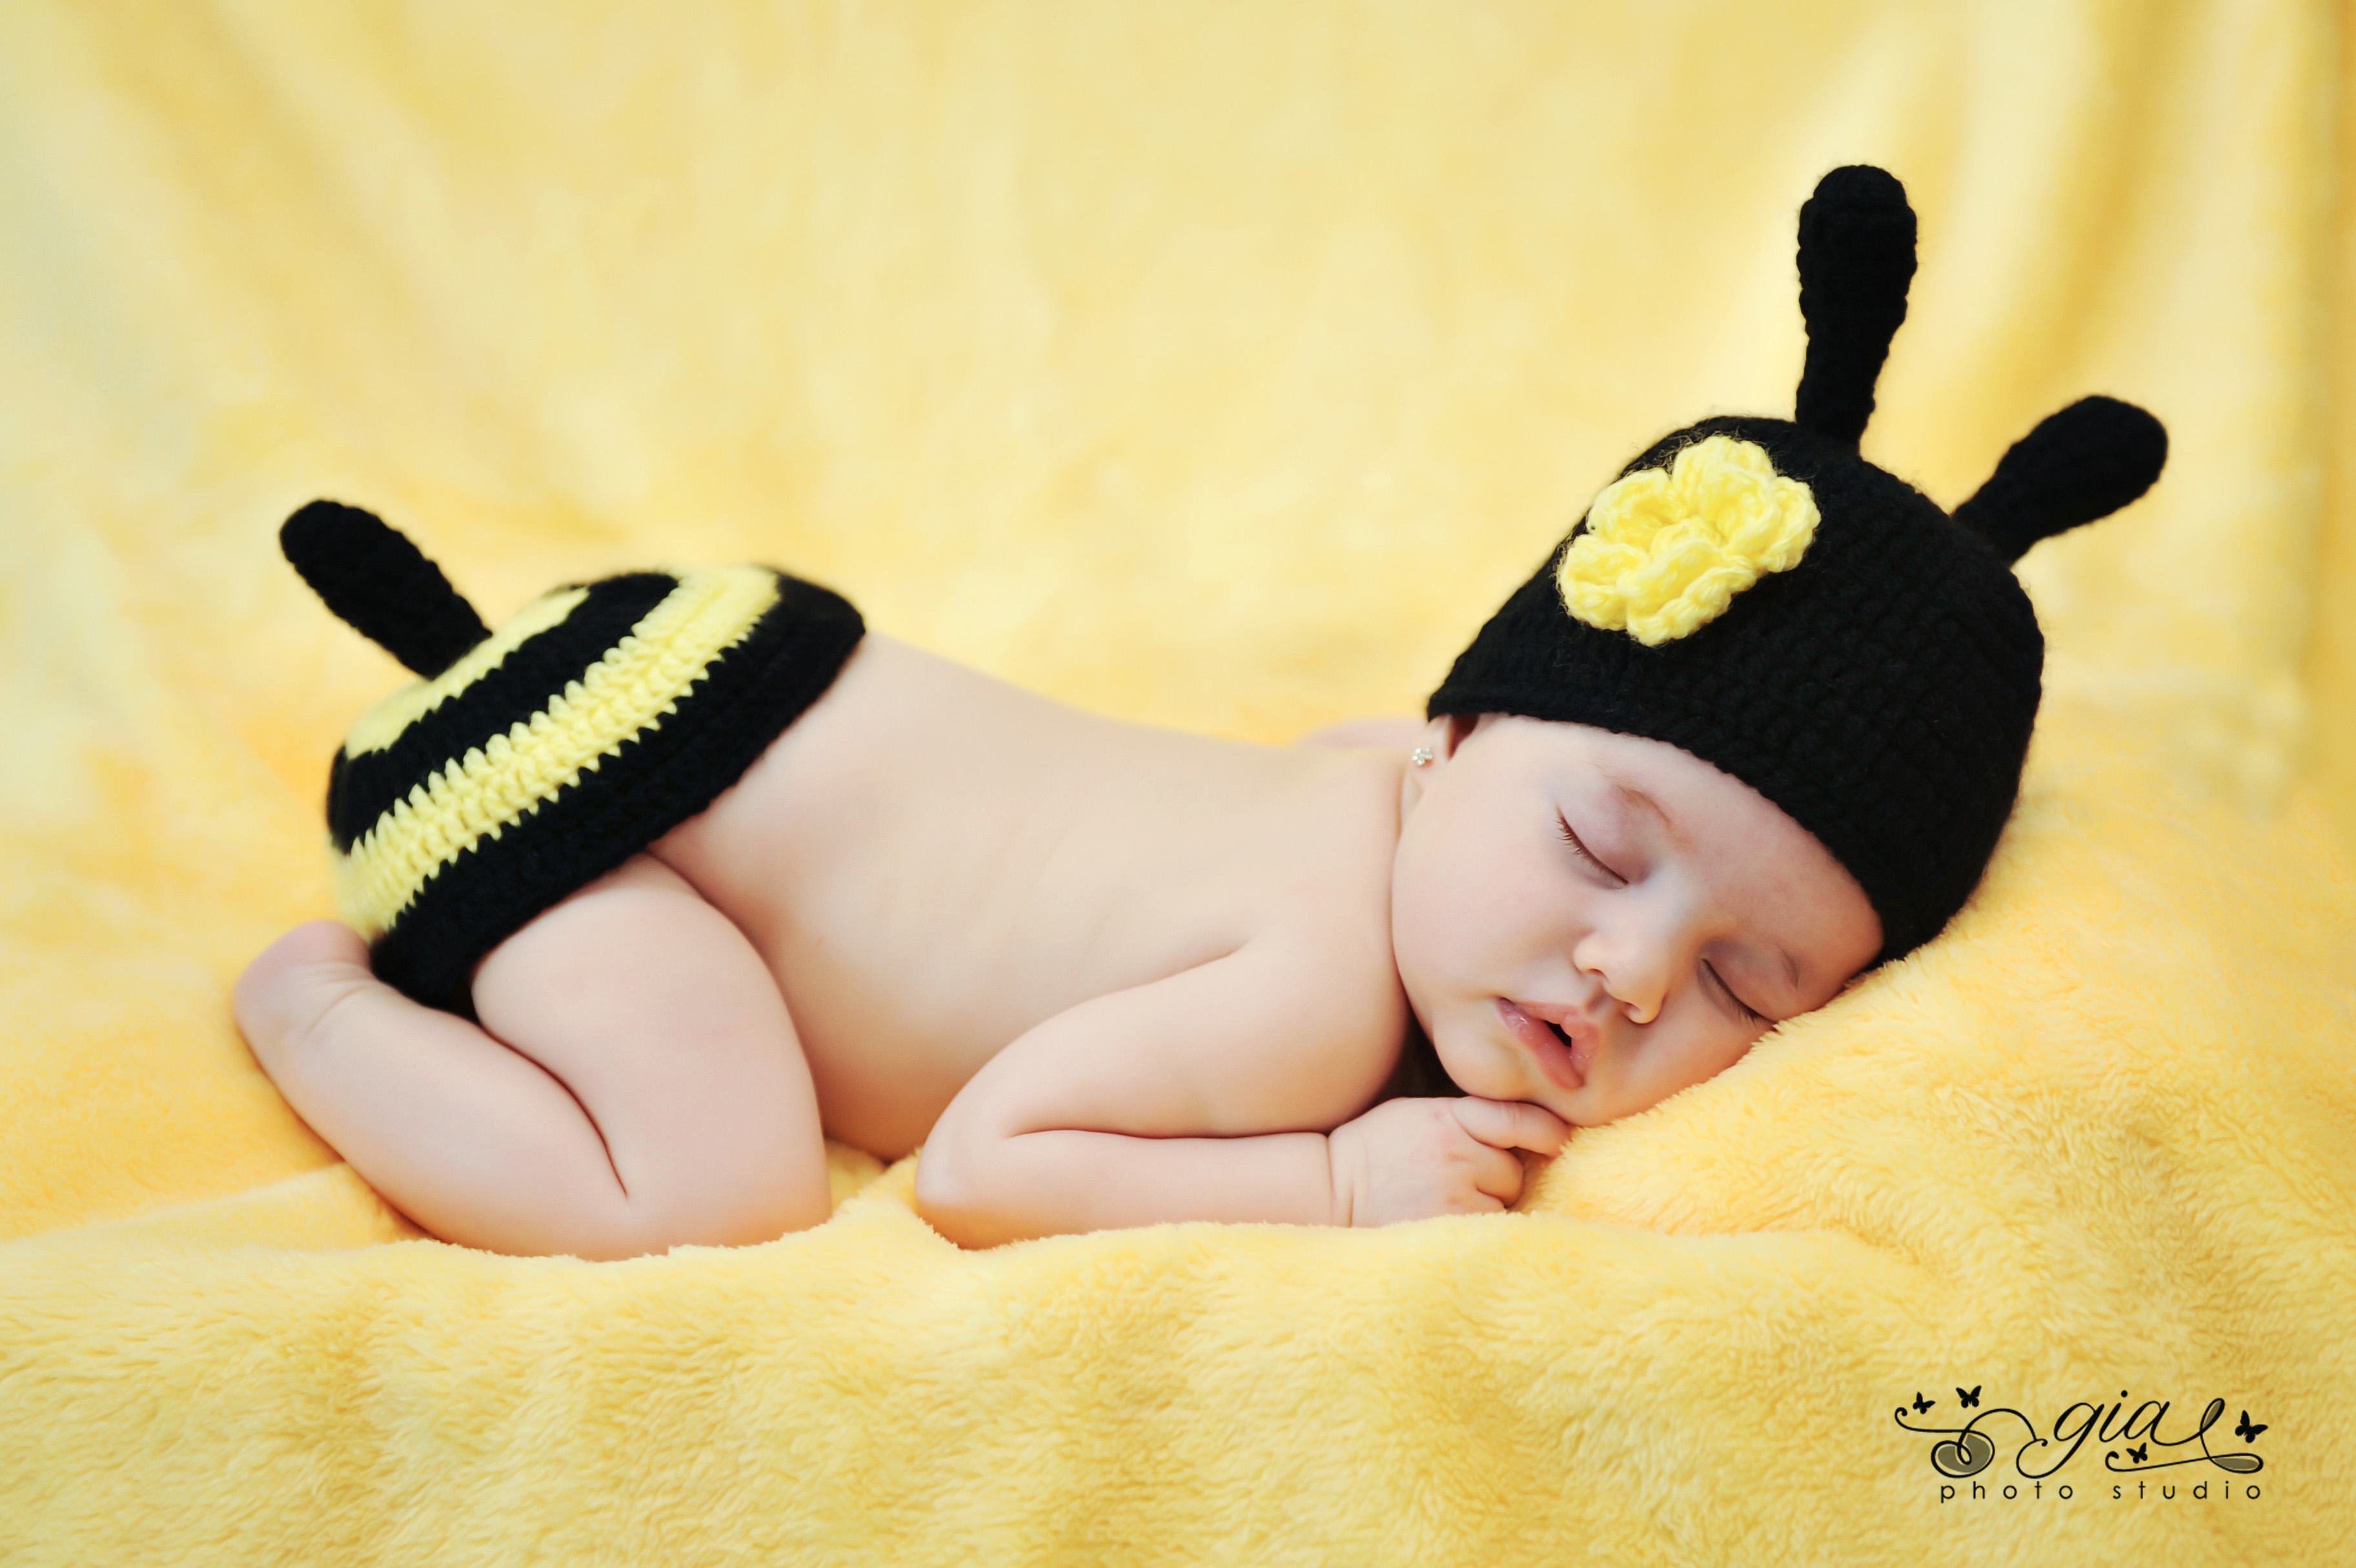 Poze copii nou nascuti 15